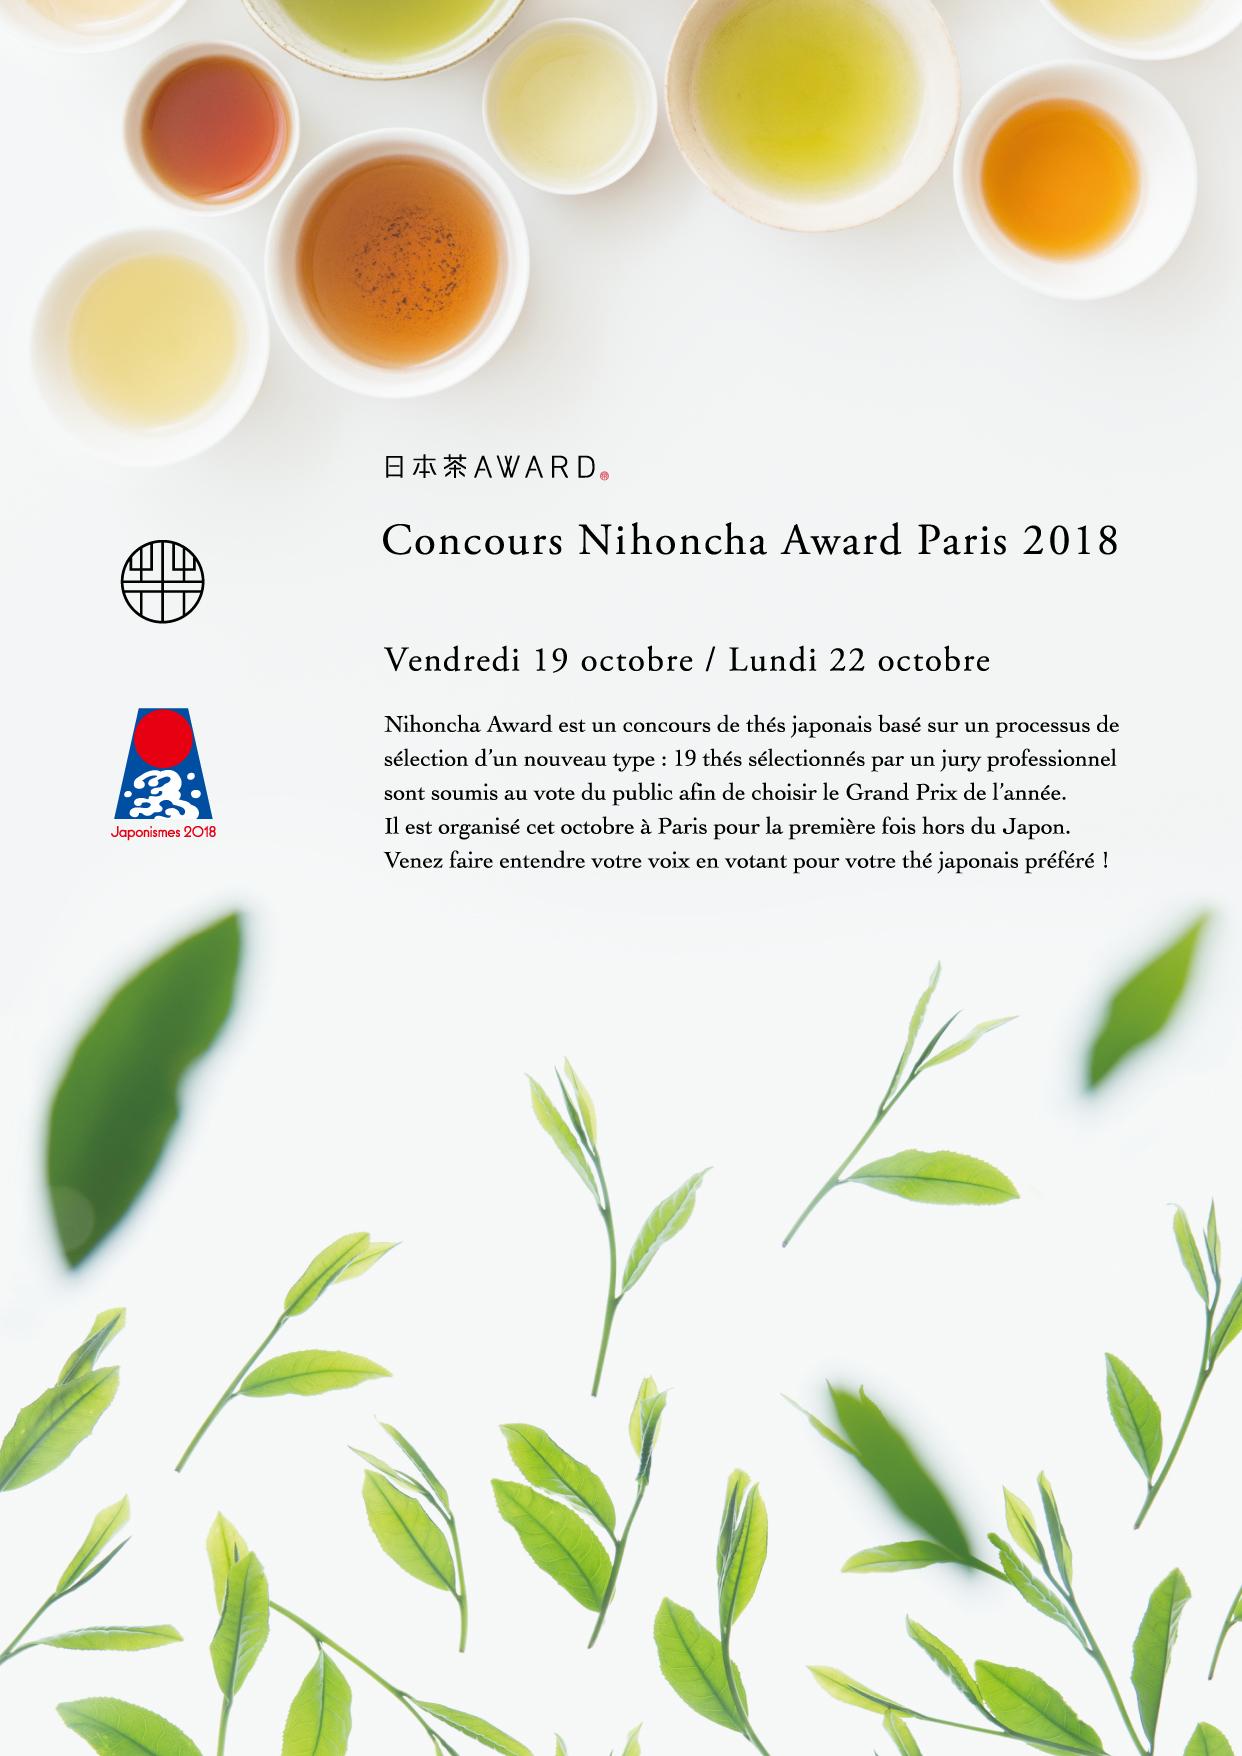 日本茶AWARD2018 in Paris